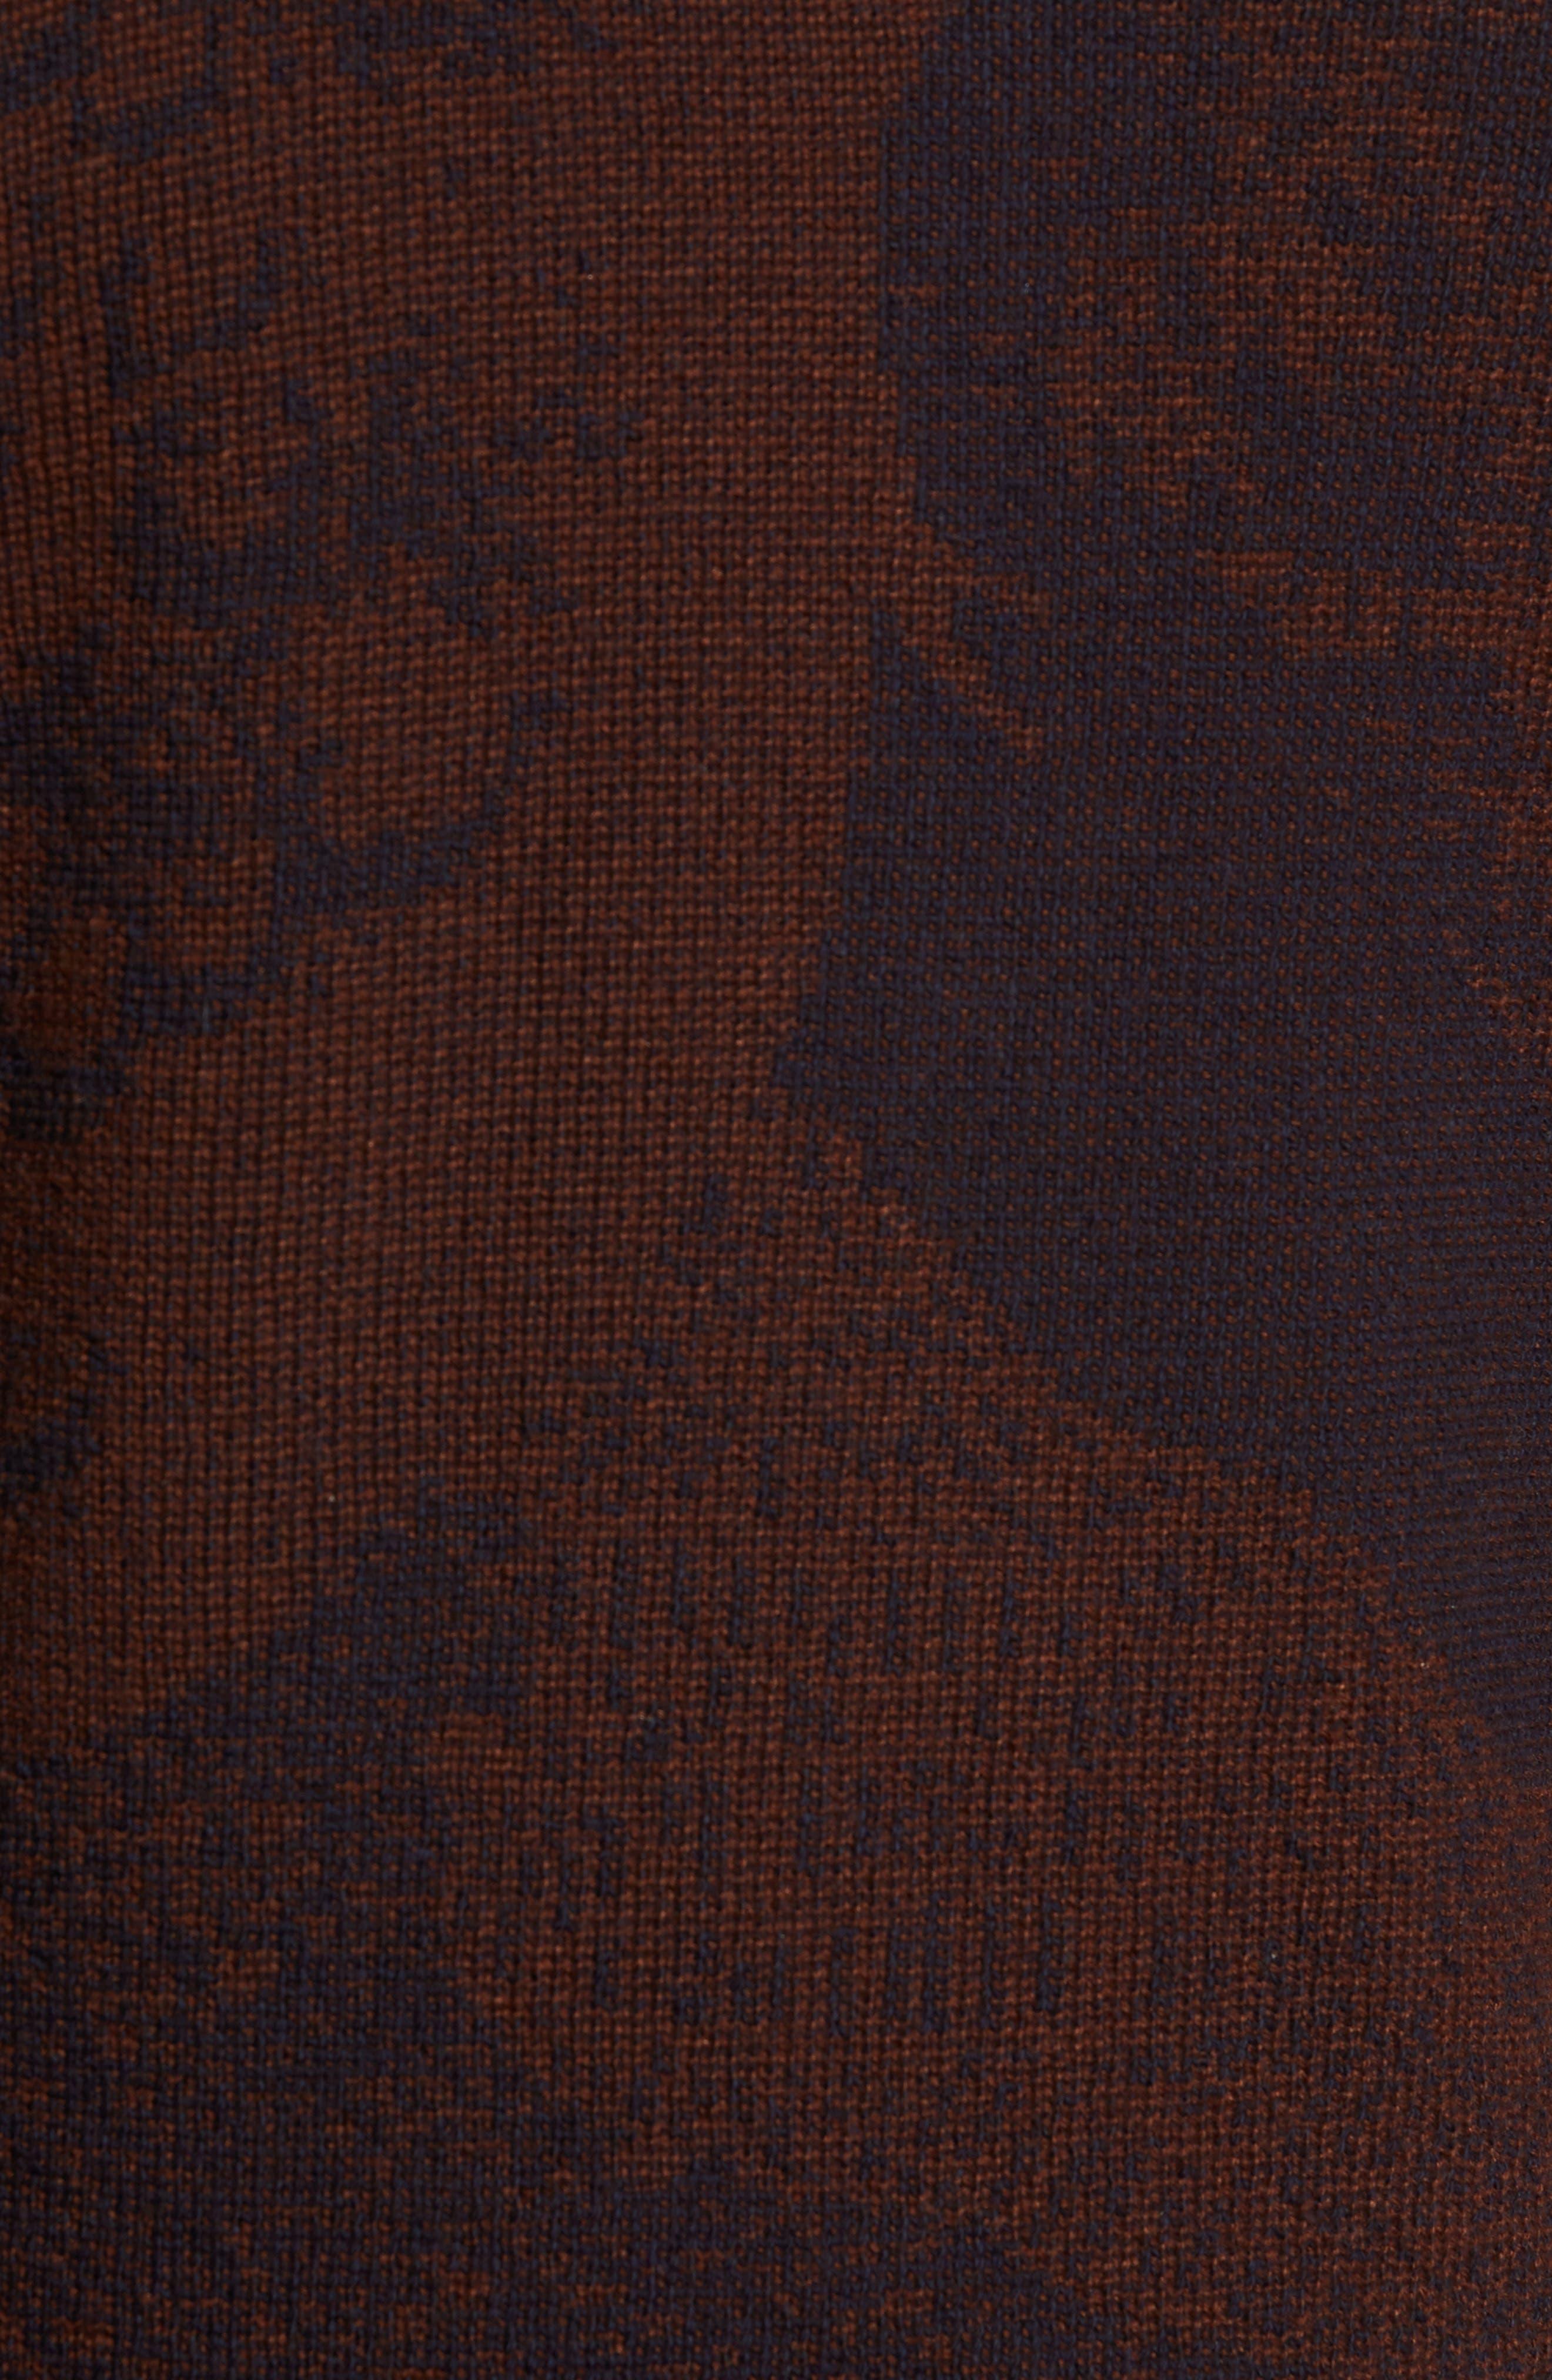 Peacock Shawl Collar Wool Blend Cardigan,                             Alternate thumbnail 5, color,                             NAVY/ RUST